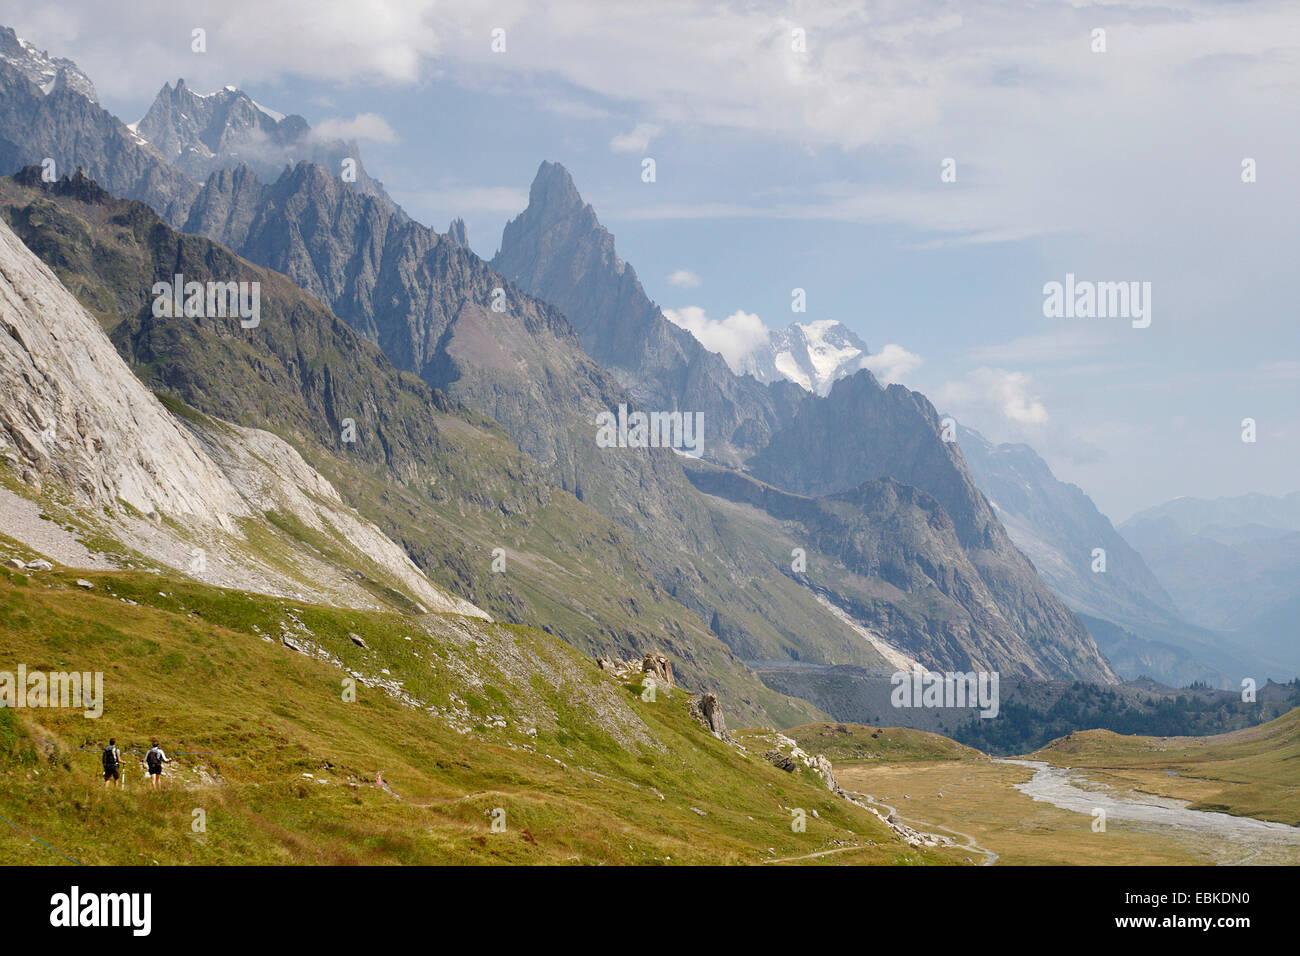 hiker in Val Veny, Aiguille Noire de Peuterey, Italy - Stock Image